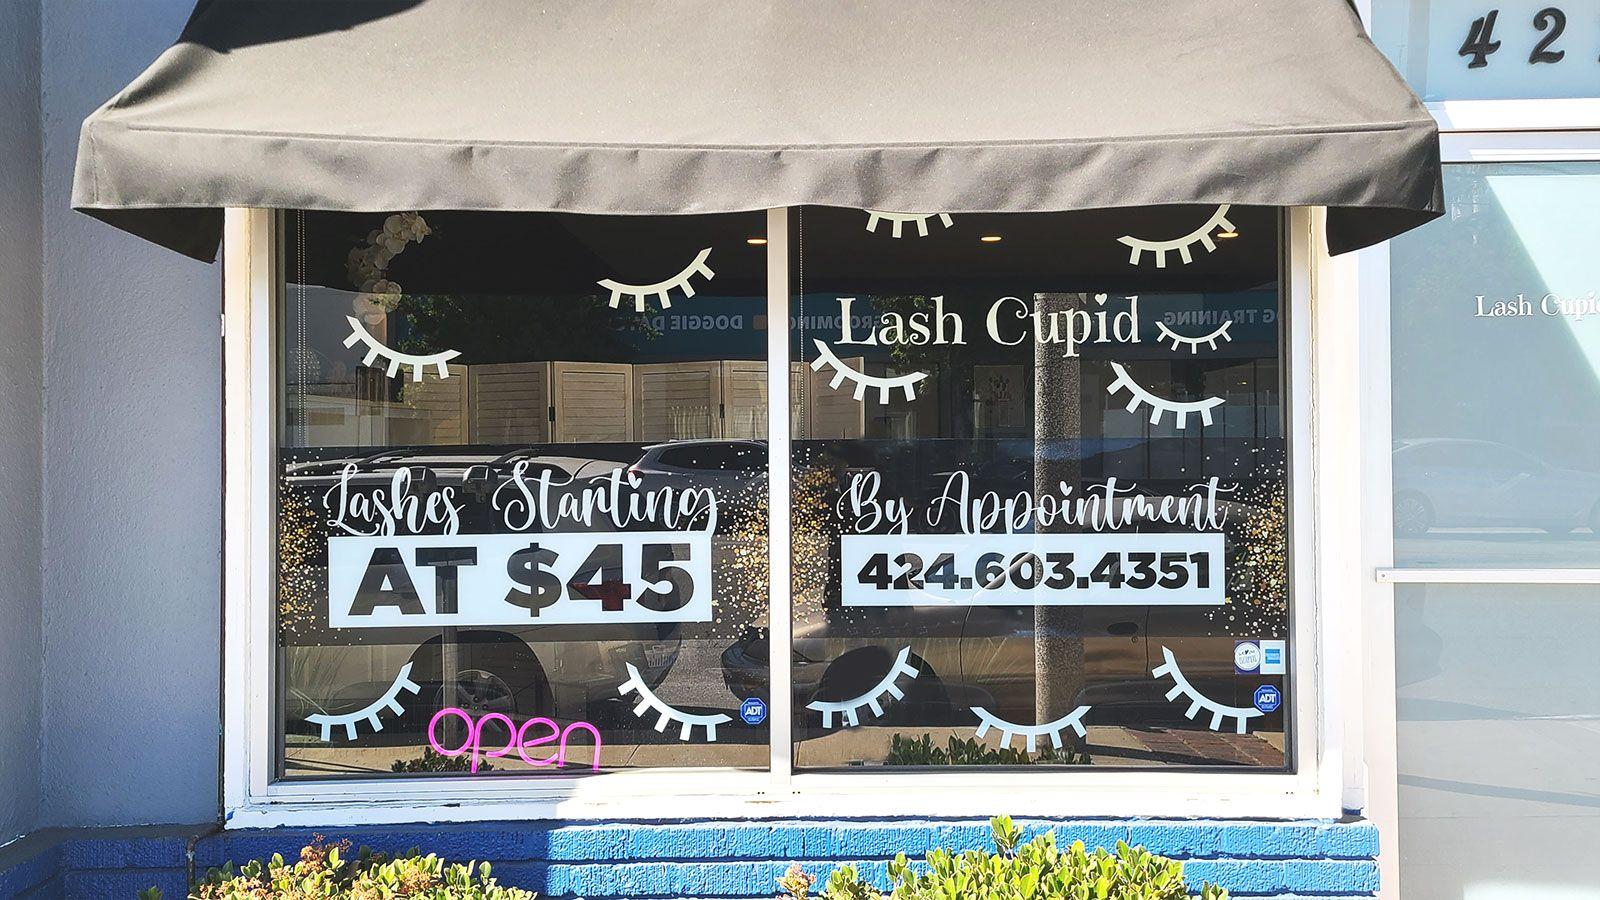 Lash Cupid storefront decals